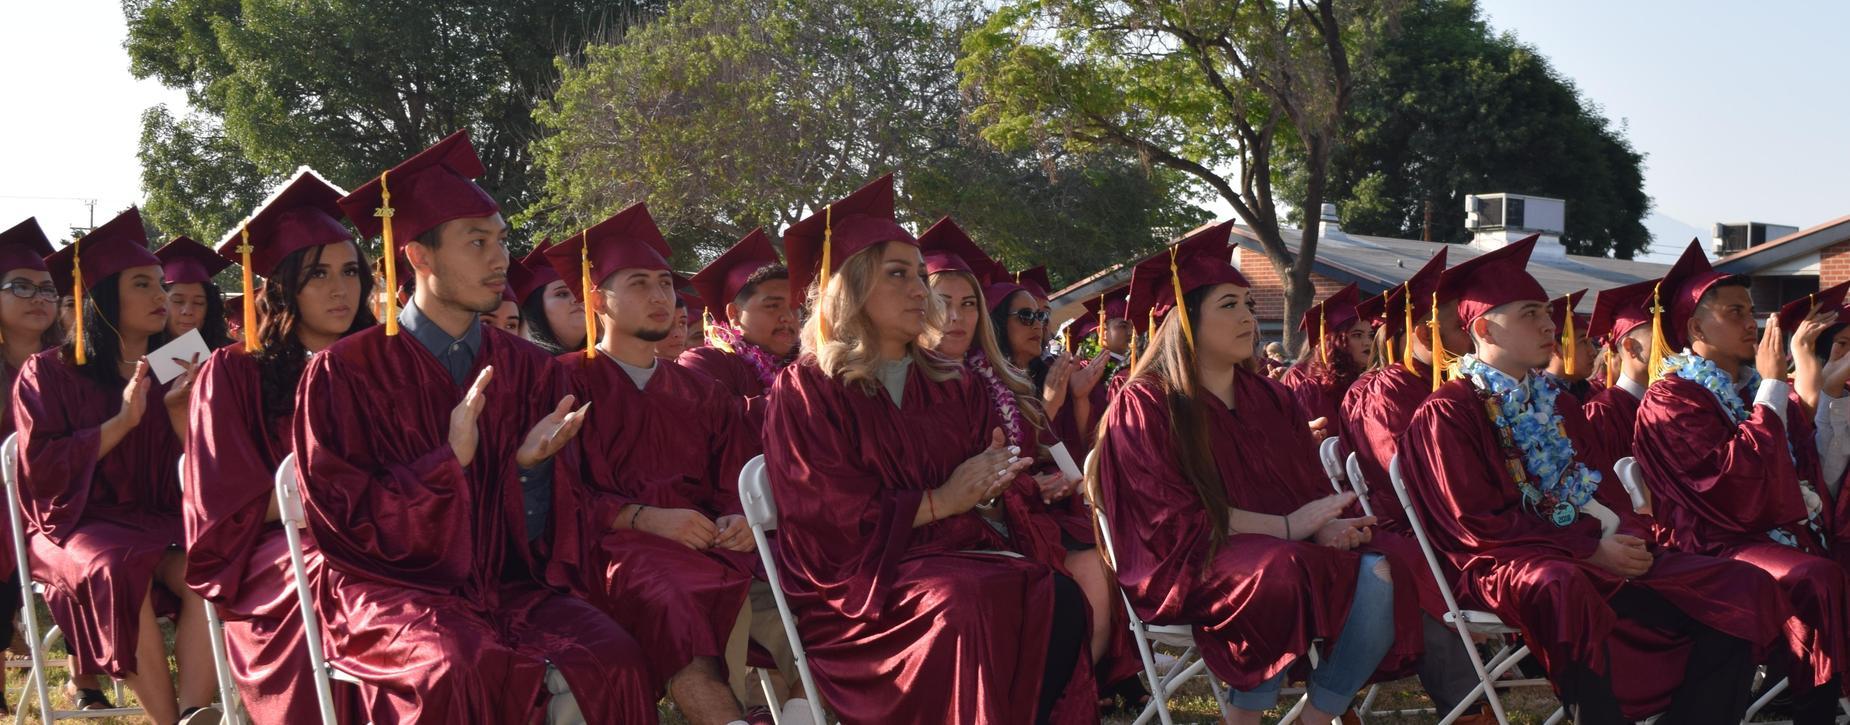 Bassett Adult Graduation